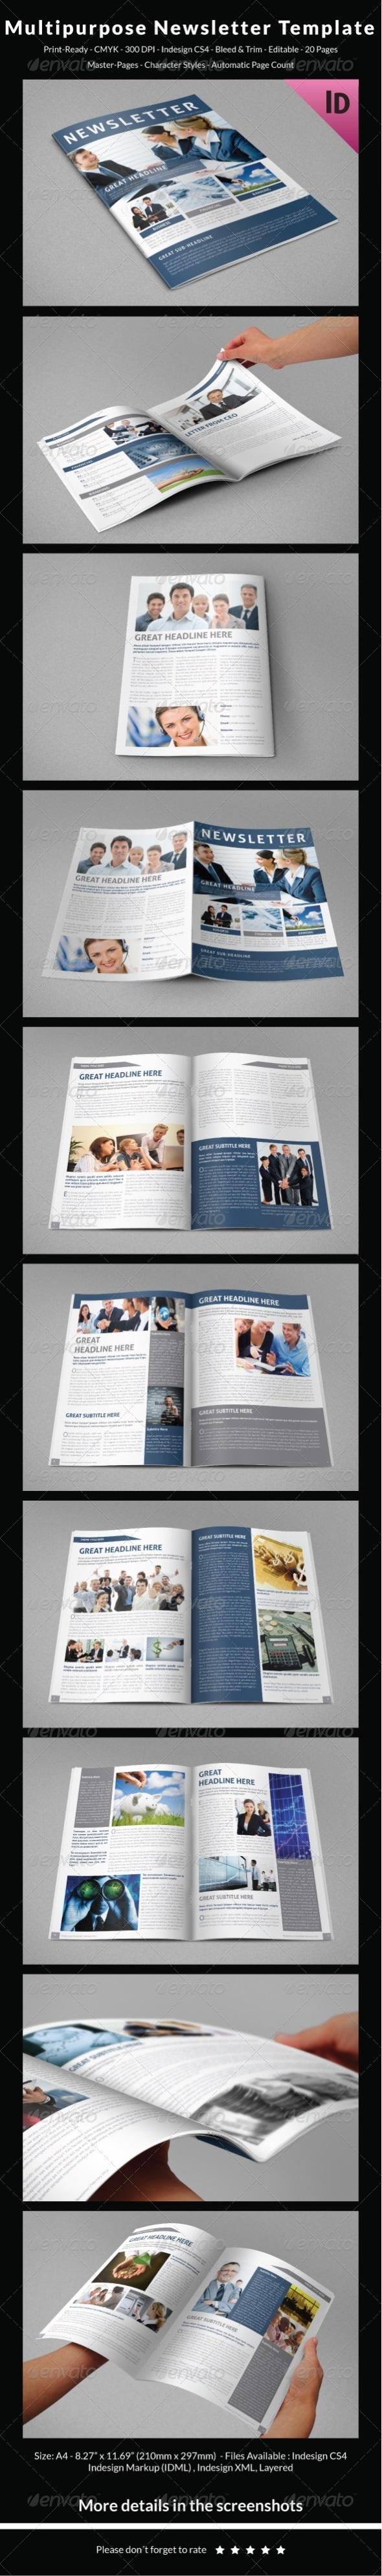 GraphicRiver Multipurpose Newsletter Template 6961183